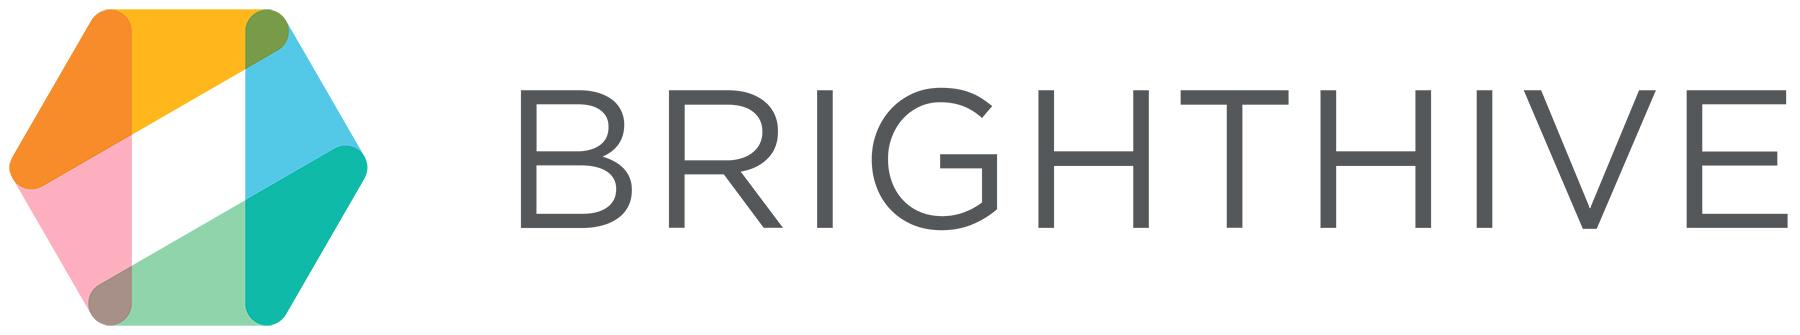 BrightHive-primary-logo